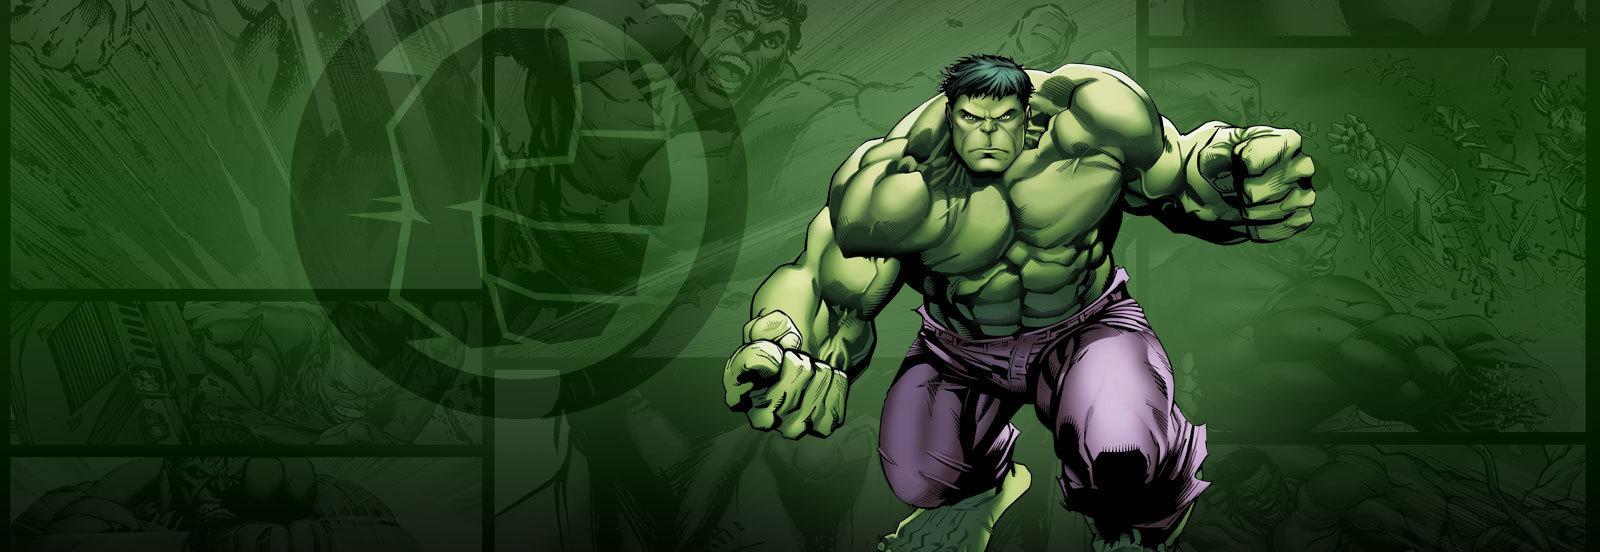 incredible-hulk-marvel-avenger-superhero-background-hd-wallpaper.jpeg